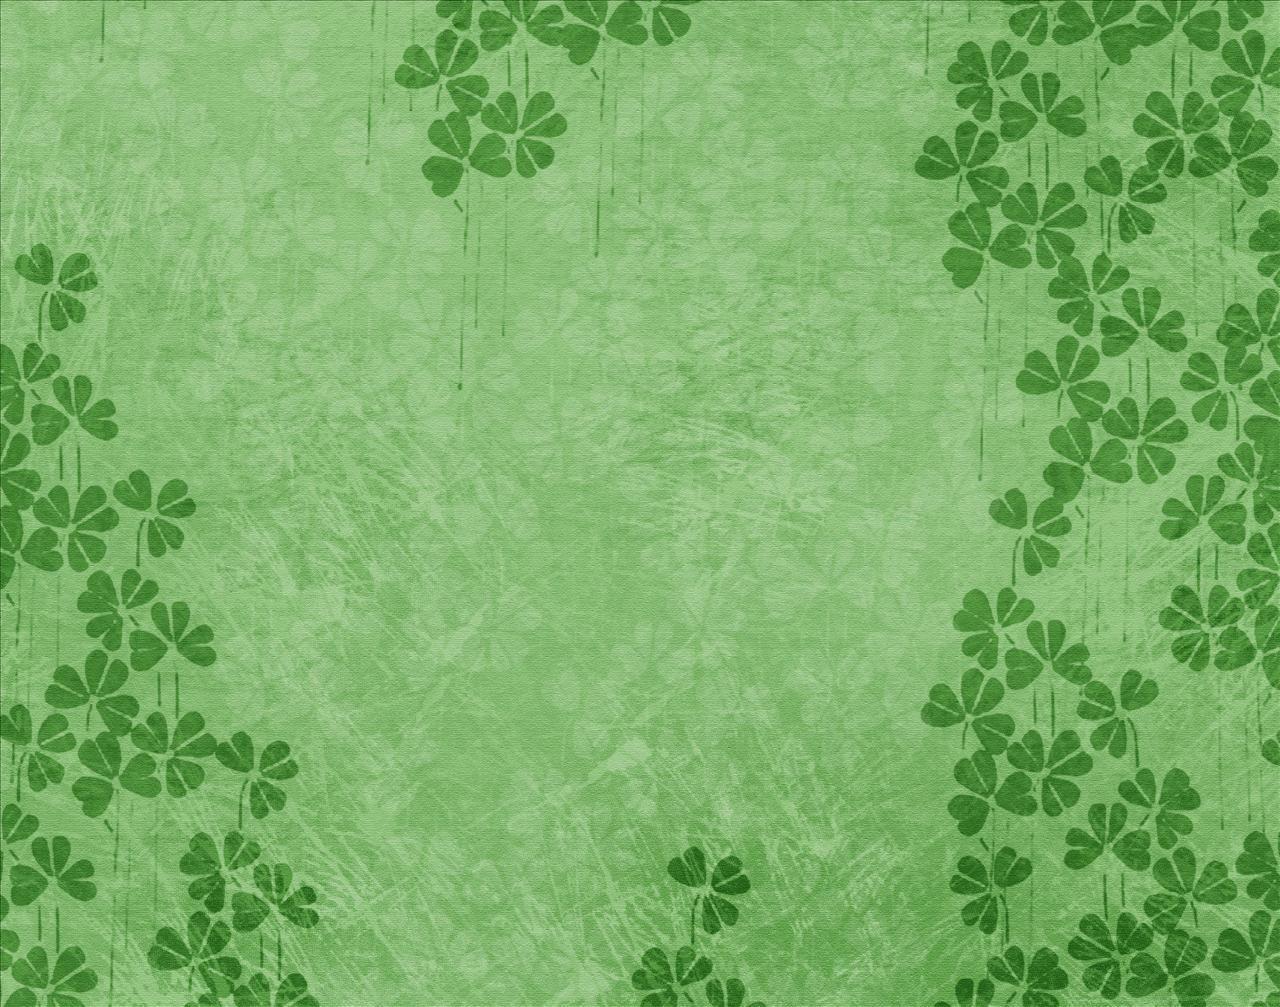 1280x1007 luck of the irish wallpaper   Google Search St 1280x1007